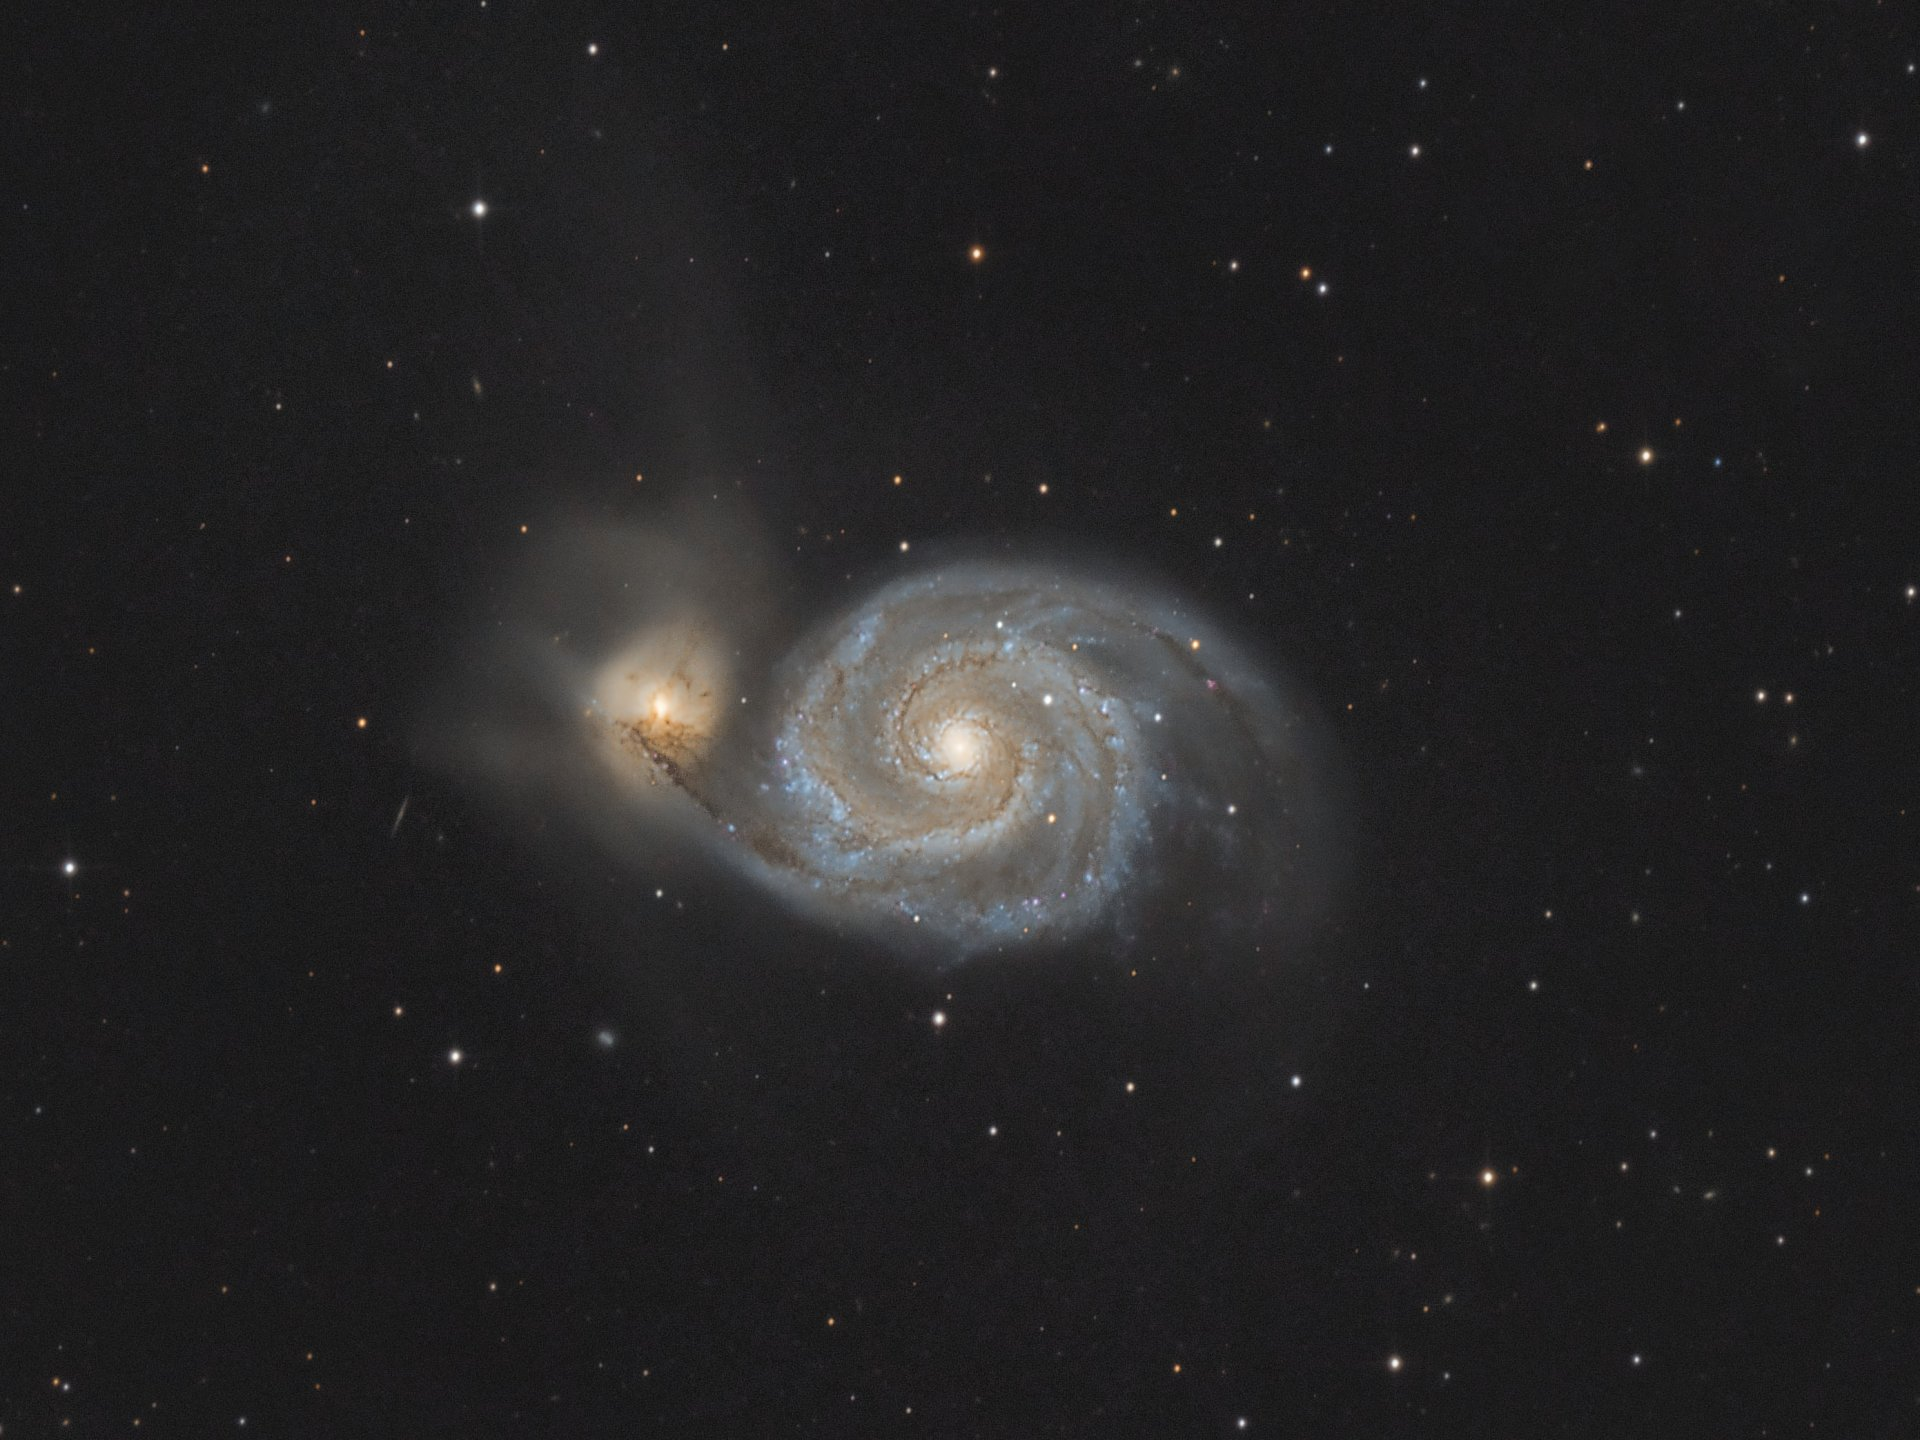 M51_2021-04_(148x200s_calBF_esd_phcc)_crop_sharpened.jpg